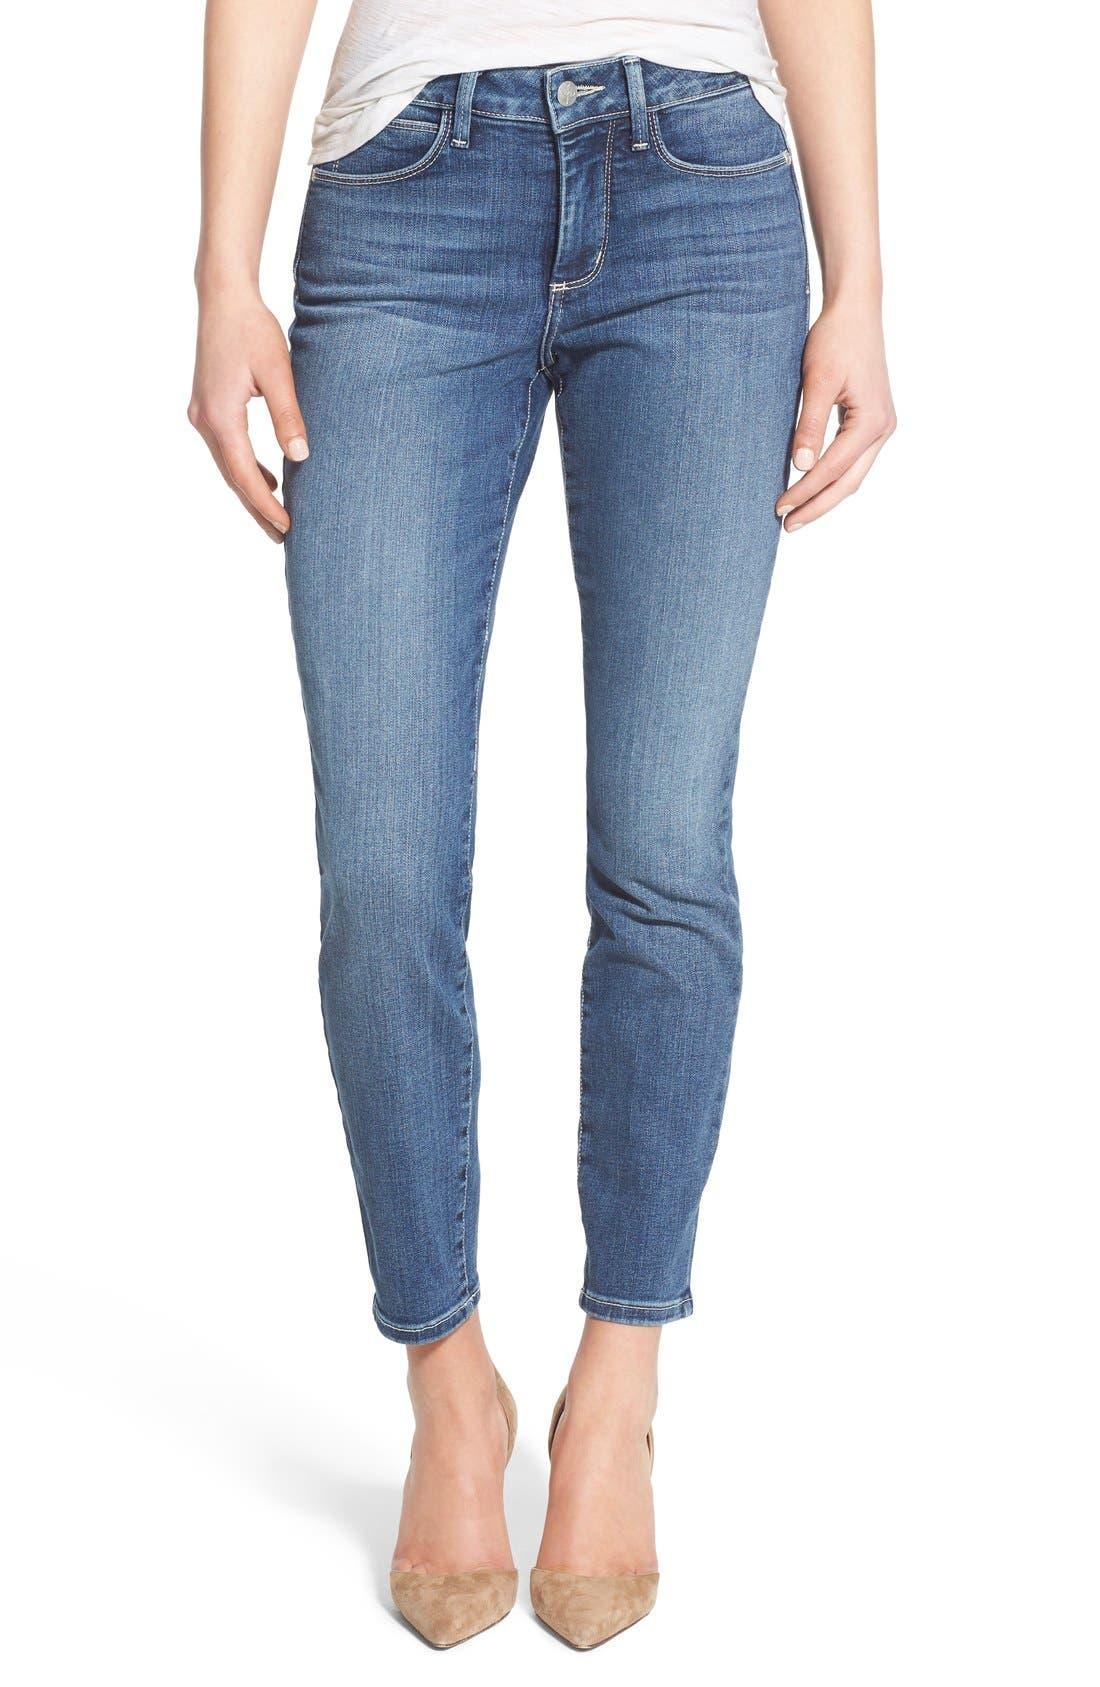 Alternate Image 1 Selected - NYDJ 'Clarissa' Stretch Ankle Skinny Jeans (Heyburn) (Regular & Petite)